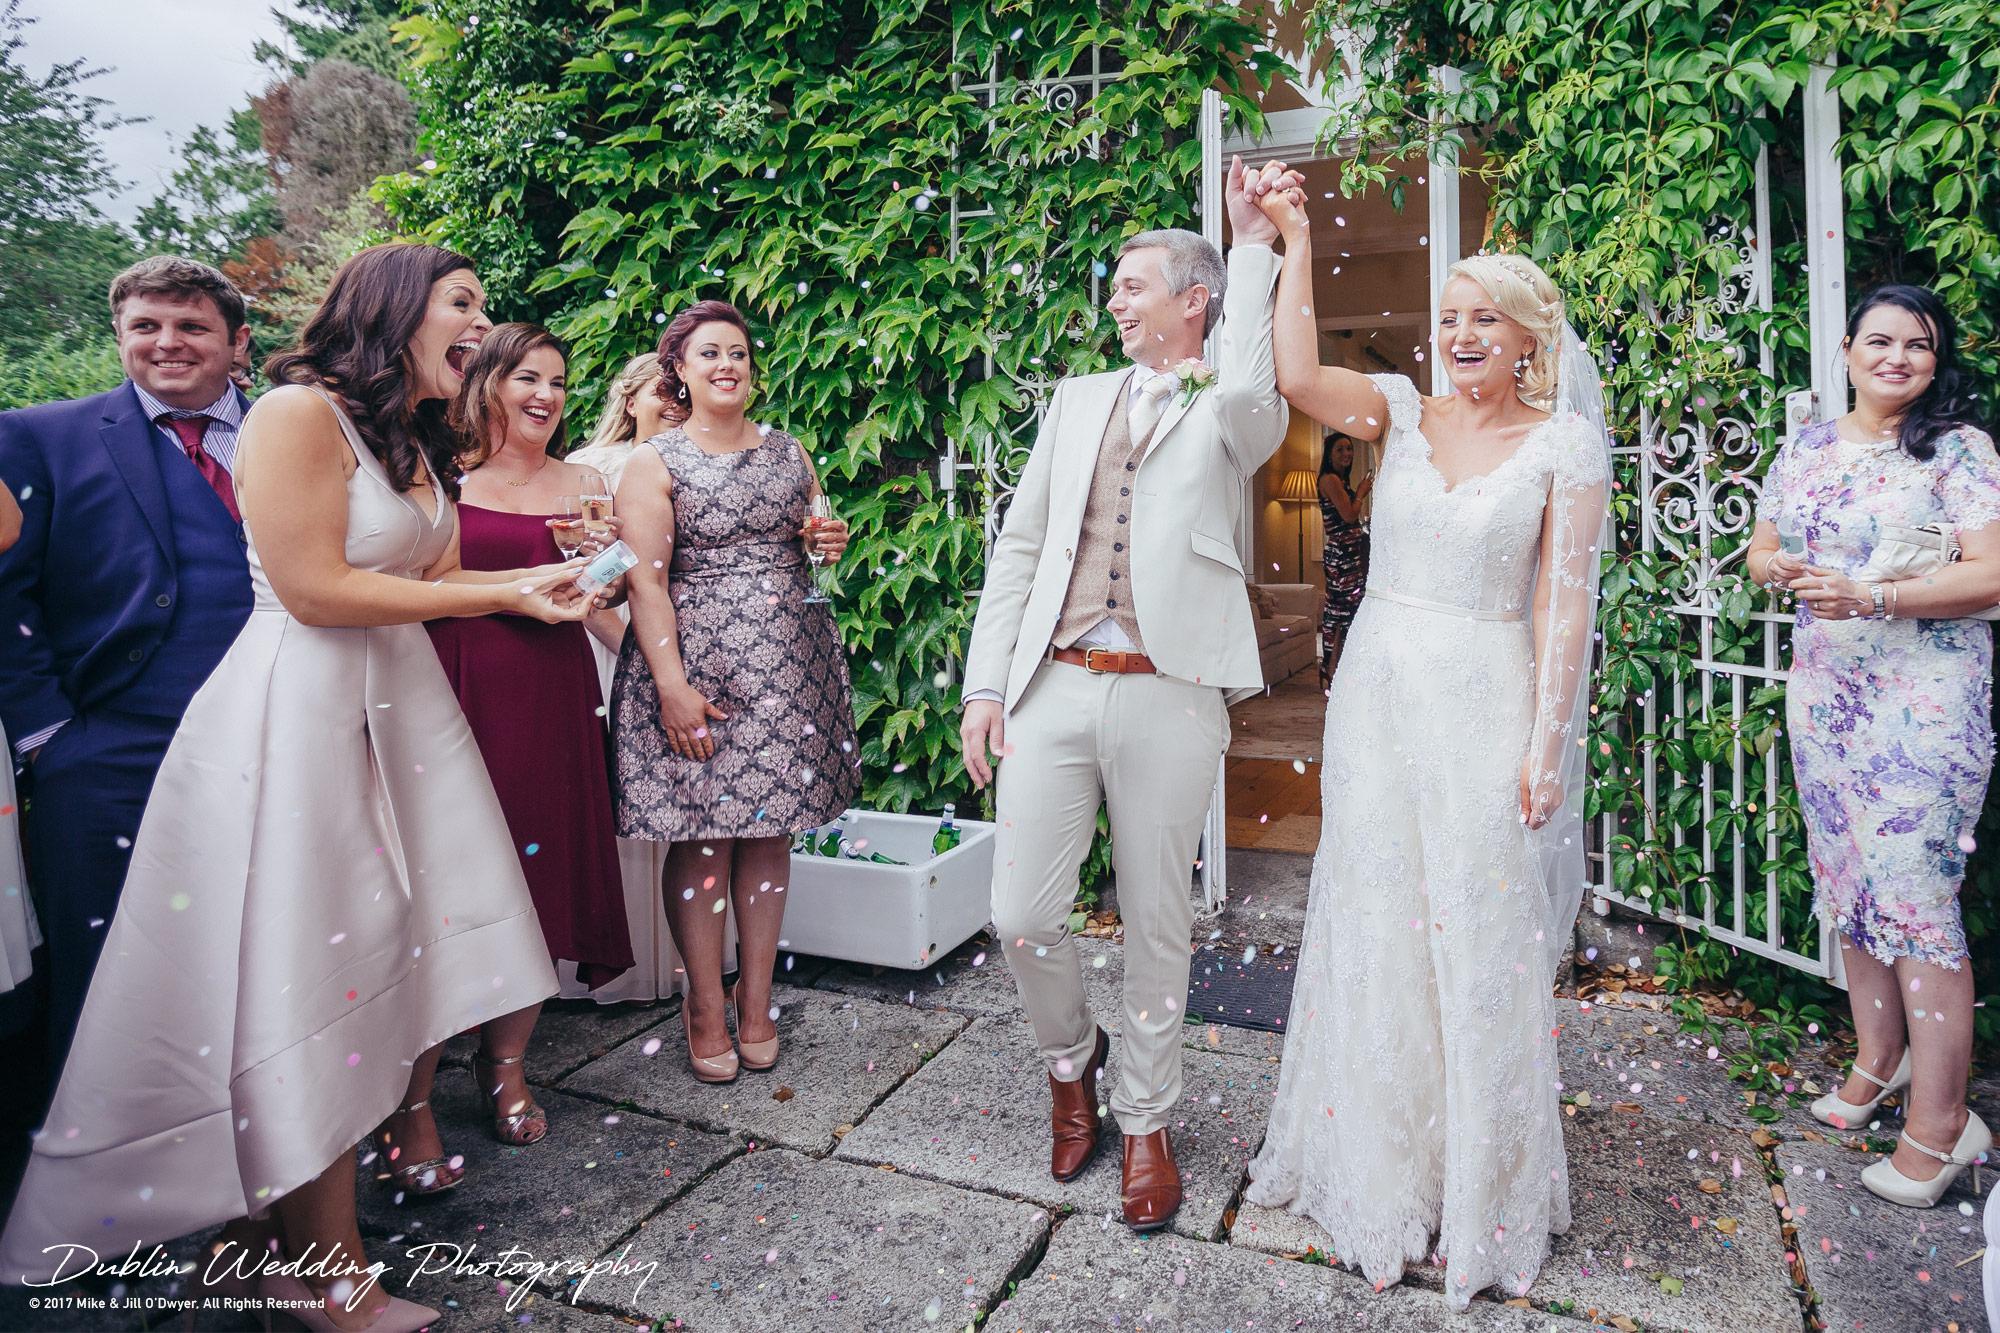 Wedding Photographer Trudder Lodge Confetti